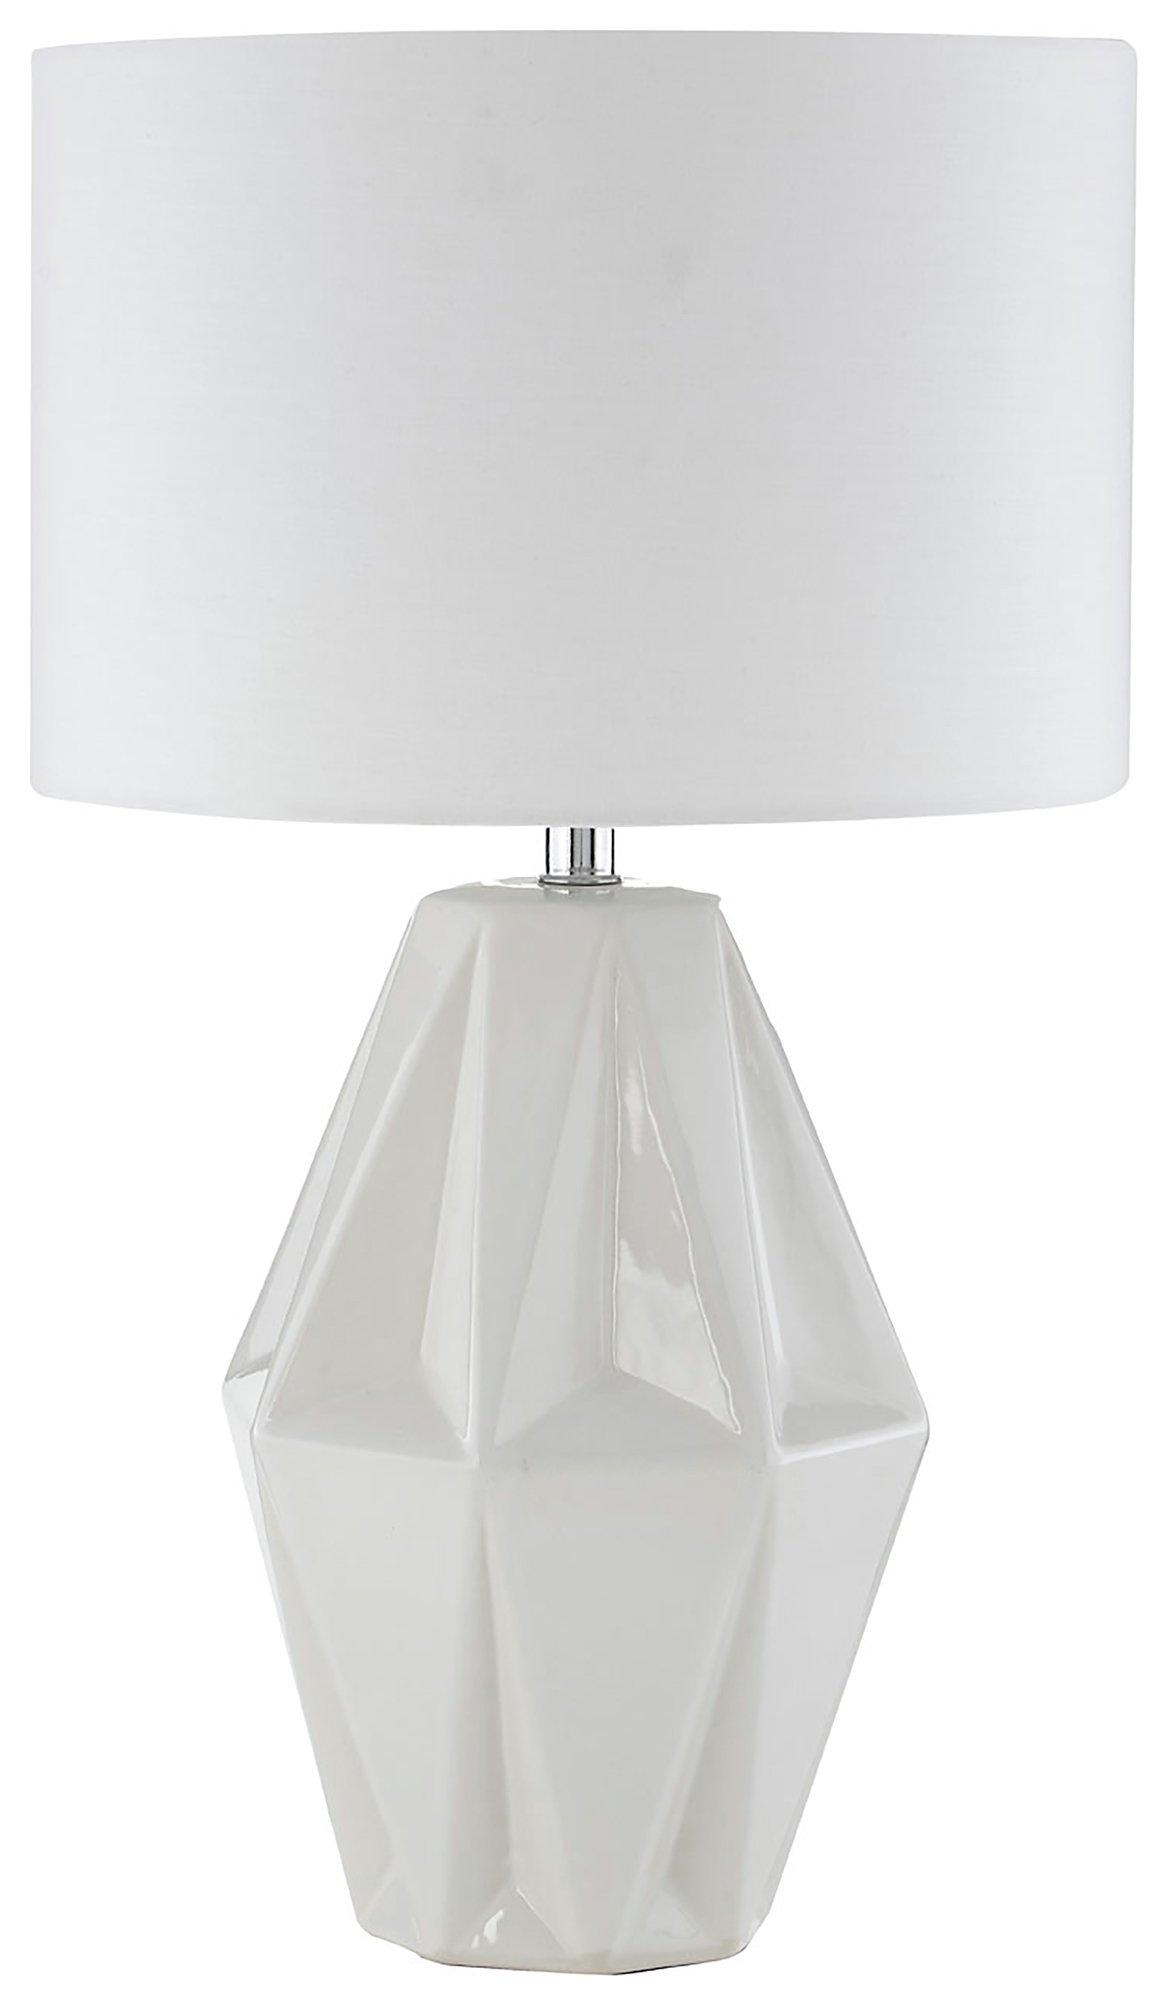 Image of Jenna - Ceramic - Table Lamp - White